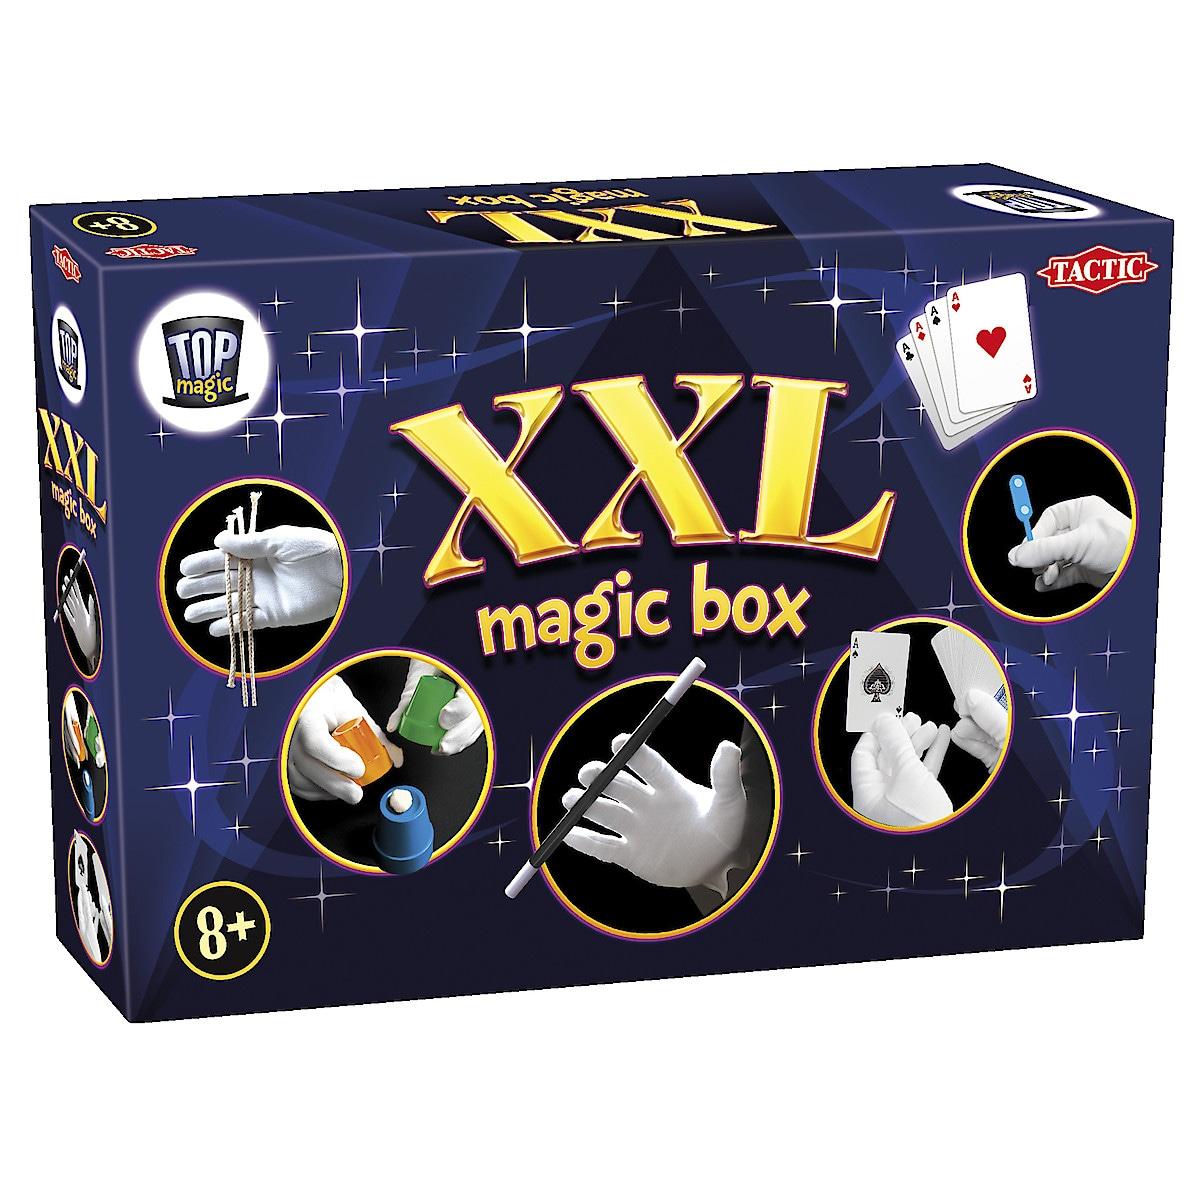 Trollerilåda Top Magic XXL